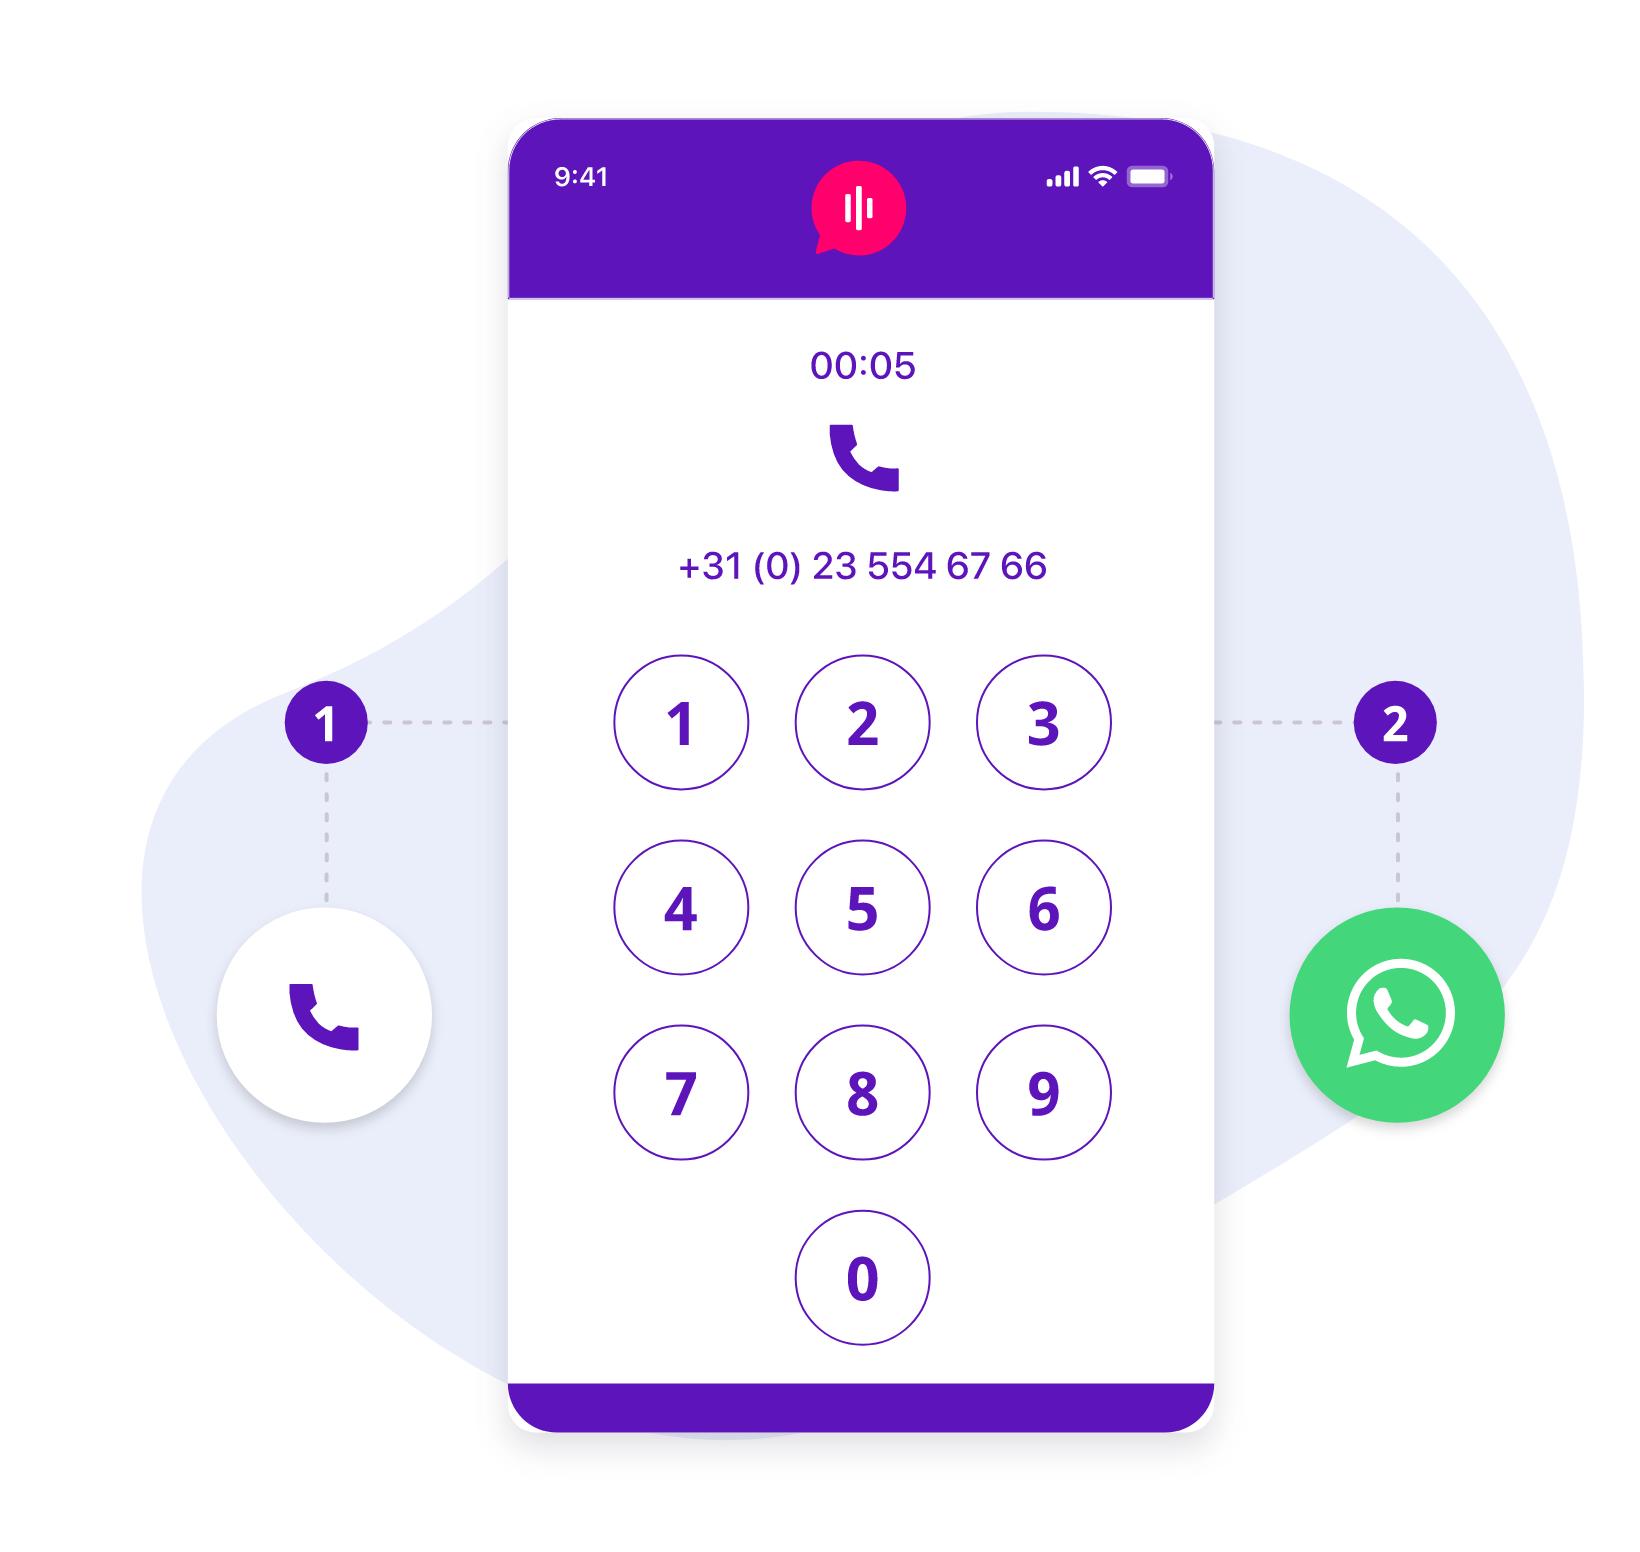 WhatsApp call deflection